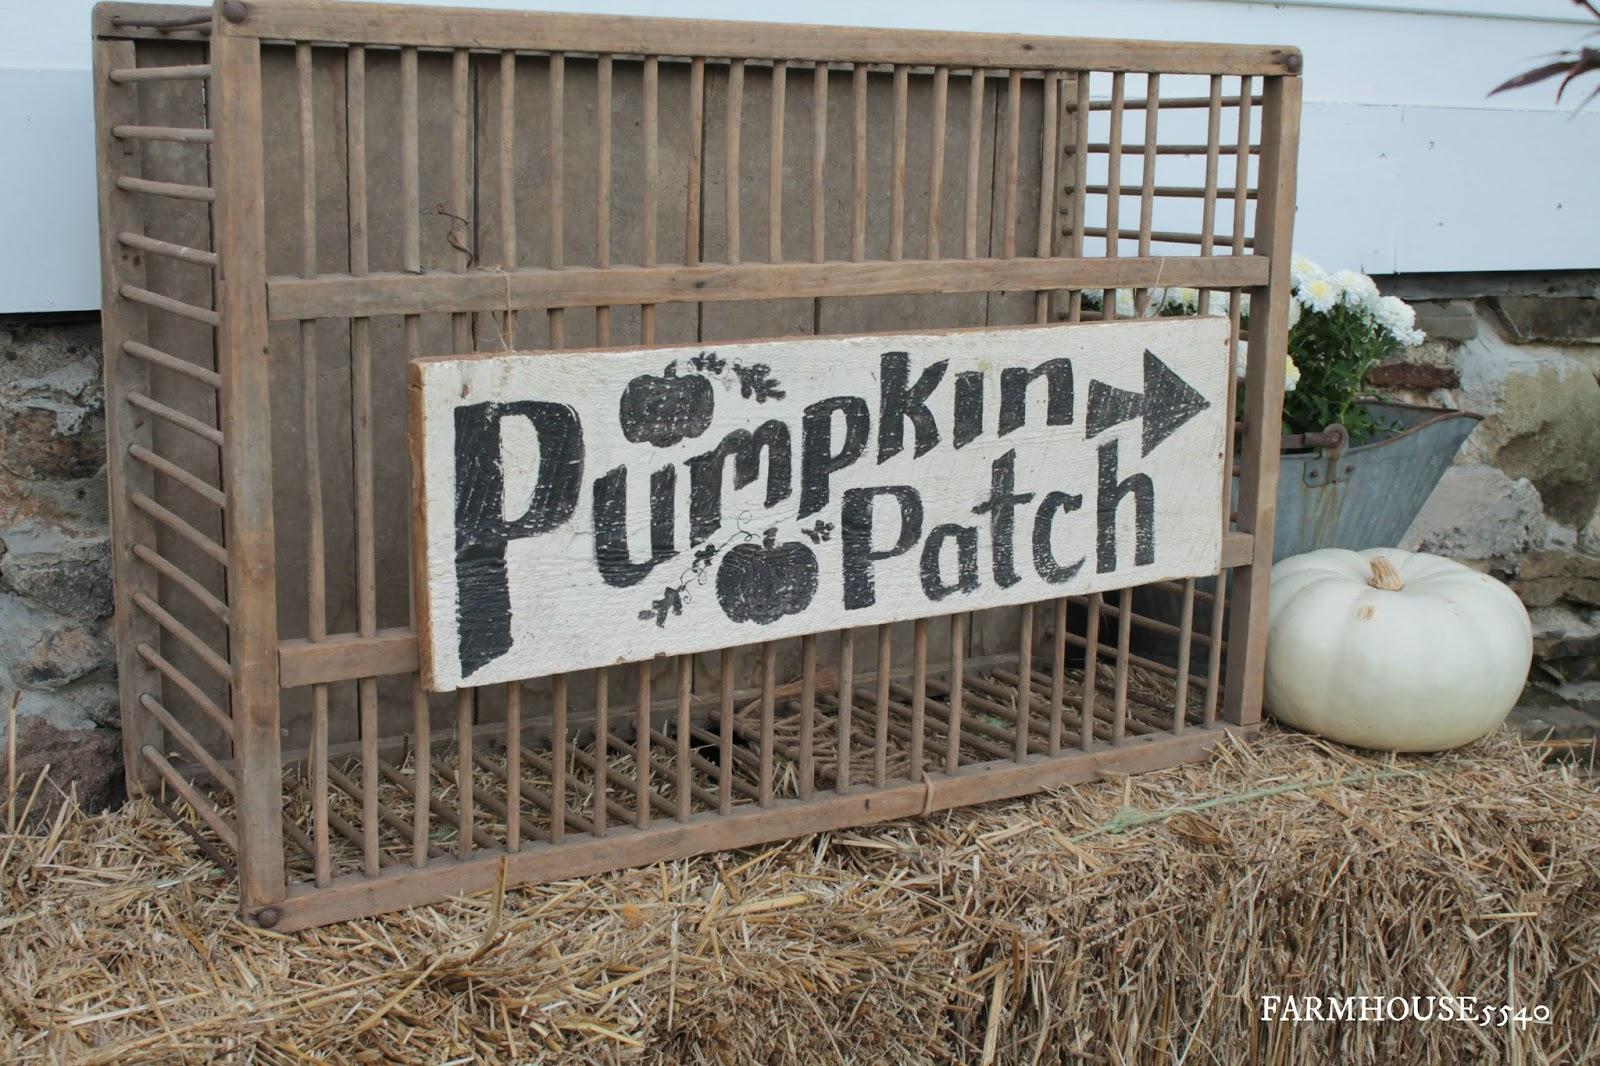 FARMHOUSE 5540 Farmhouse Autumn